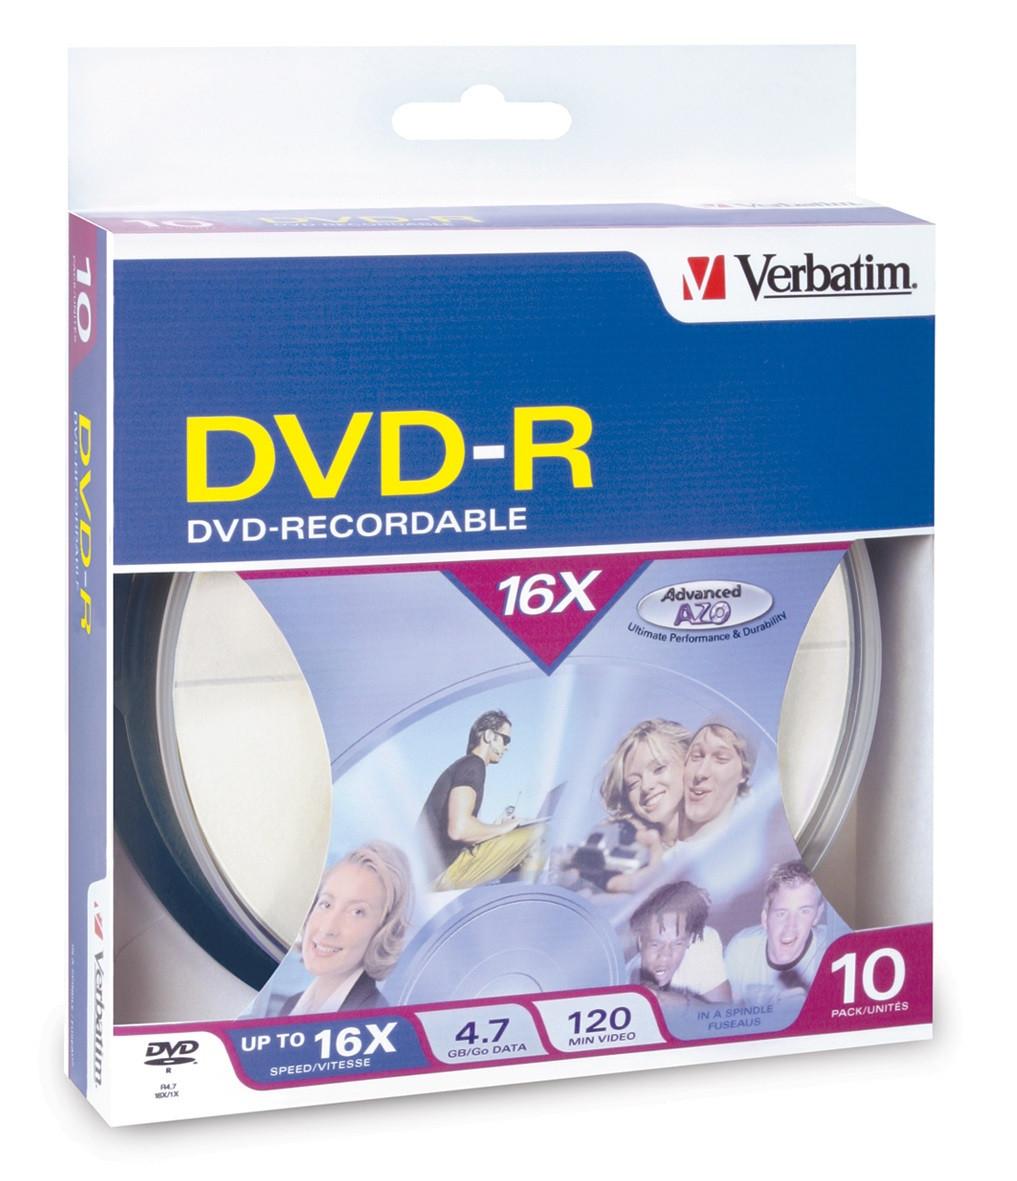 Verbatim DVD-R - 4.7GB Spindle 16X (10 Pack of 10 Pieces)